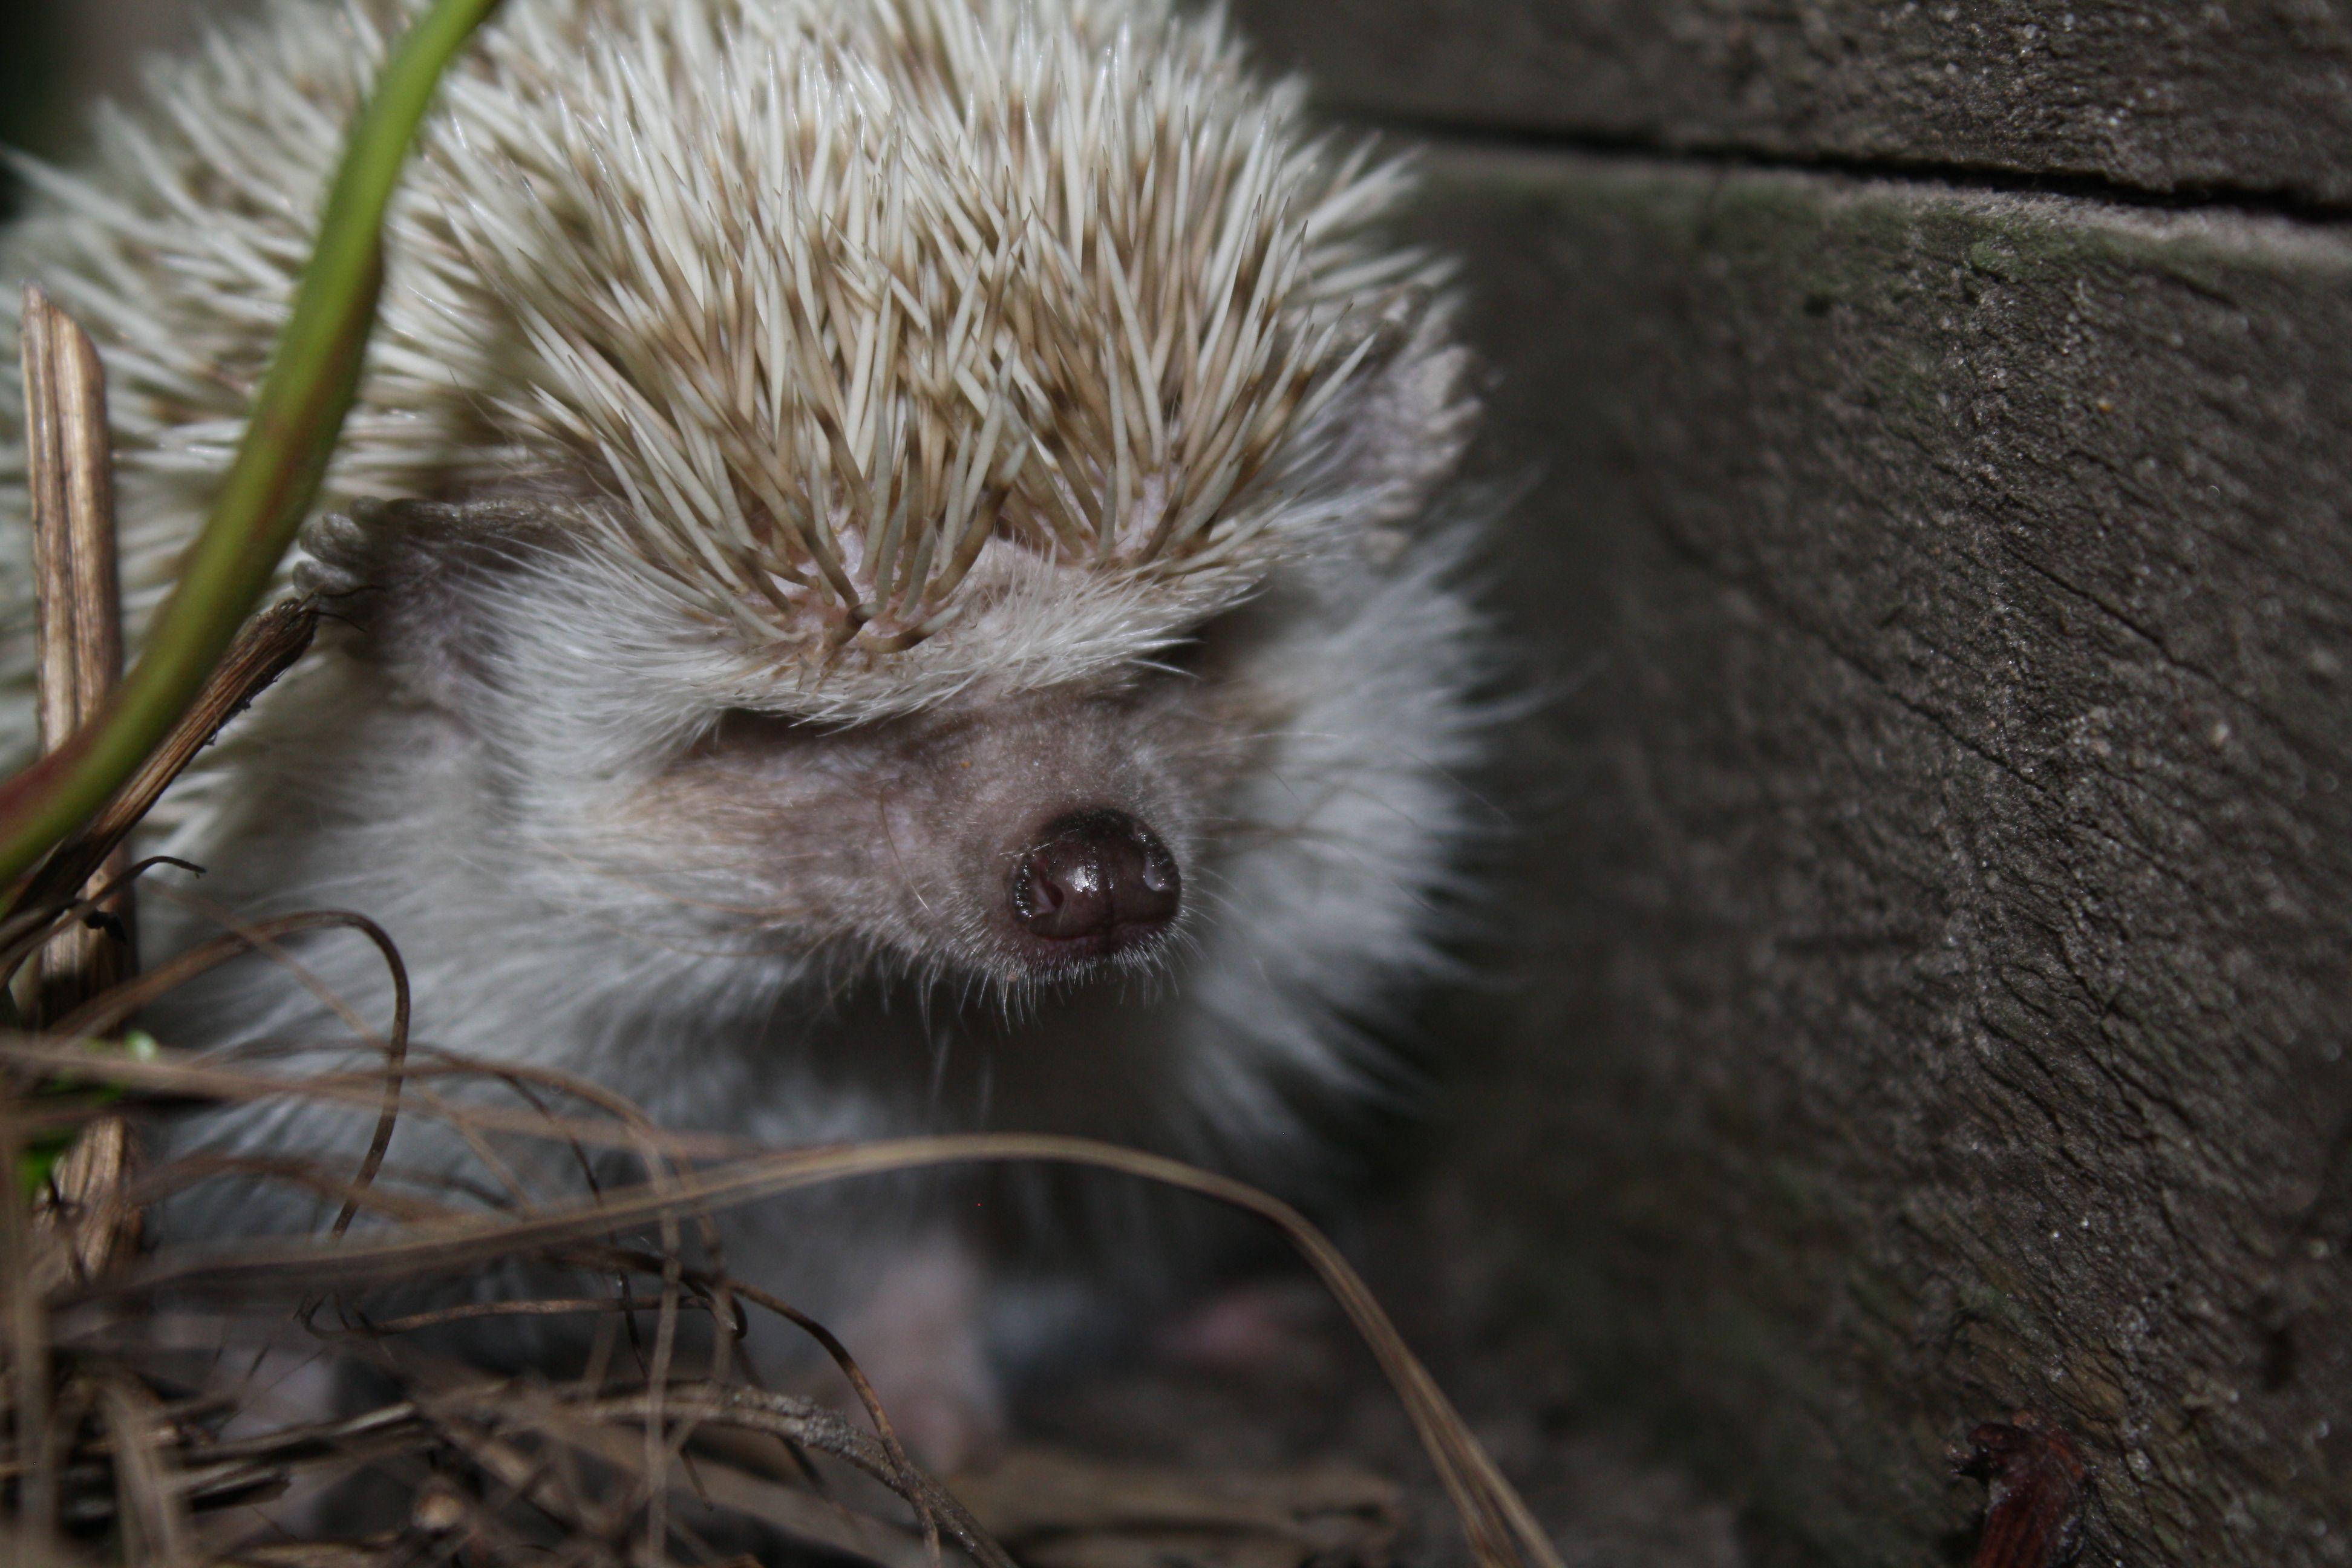 My hedgehog, Neville